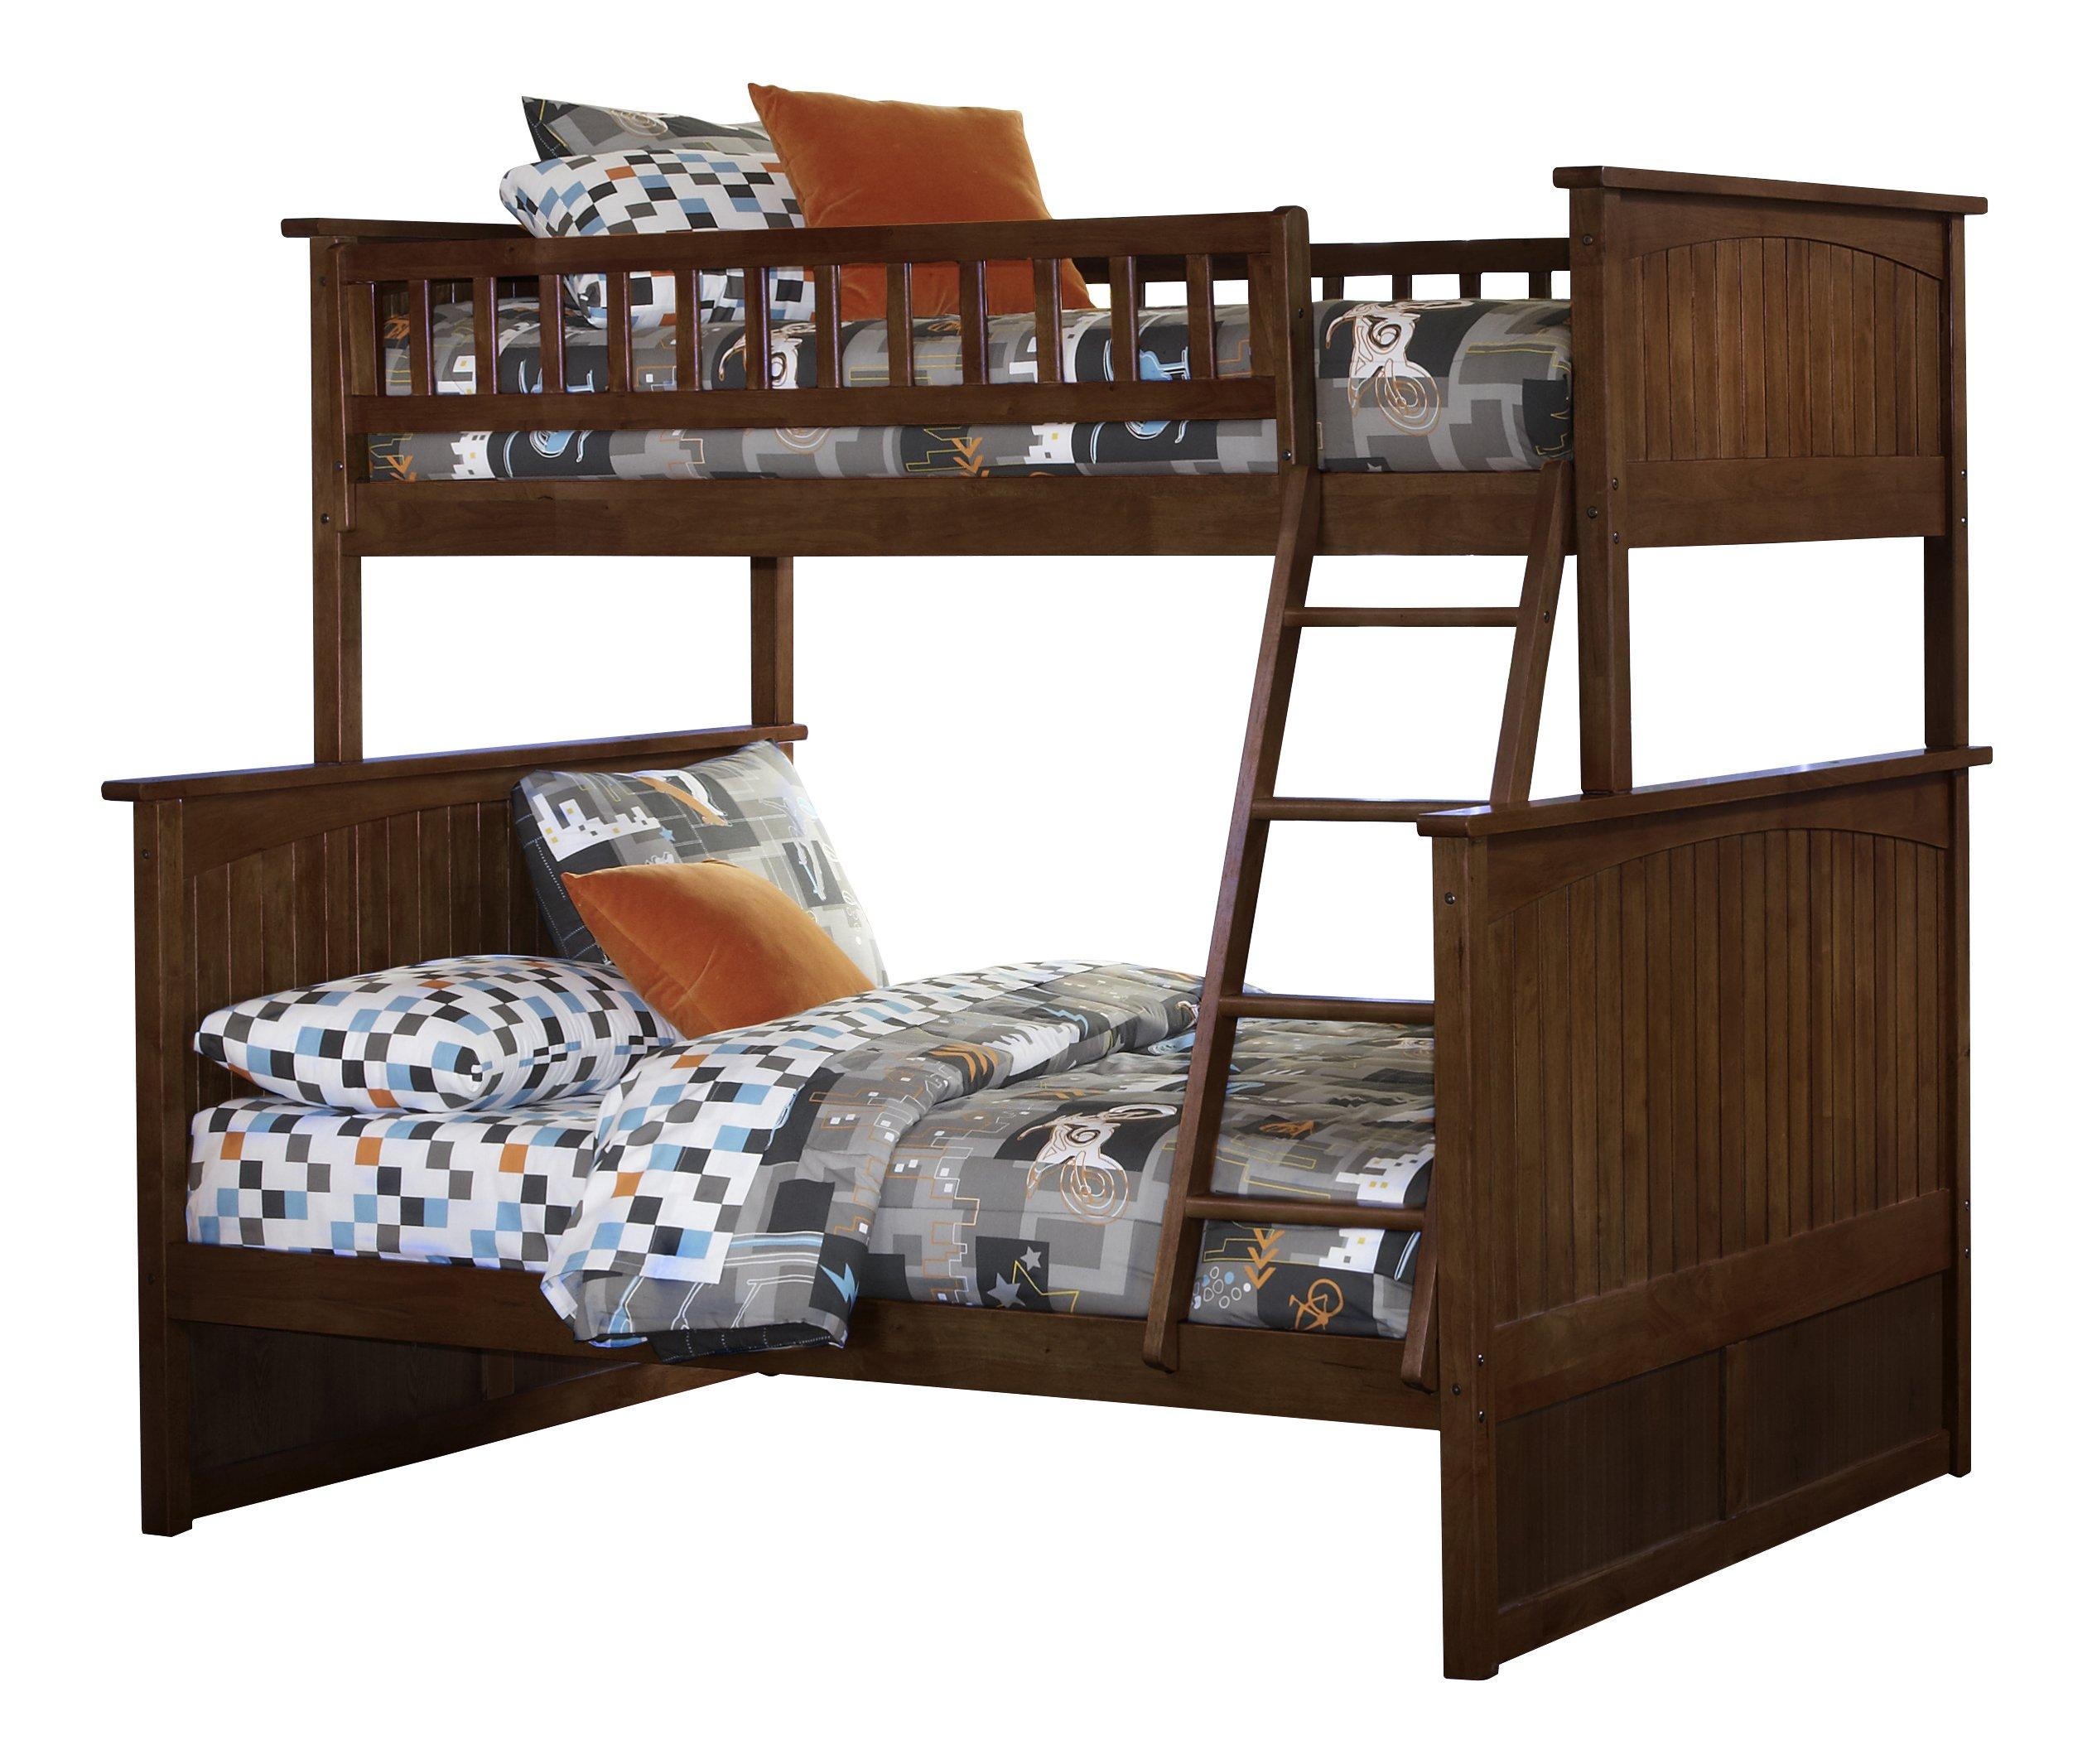 Nantucket Bunk Bed, Twin Over Full, Antique Walnut